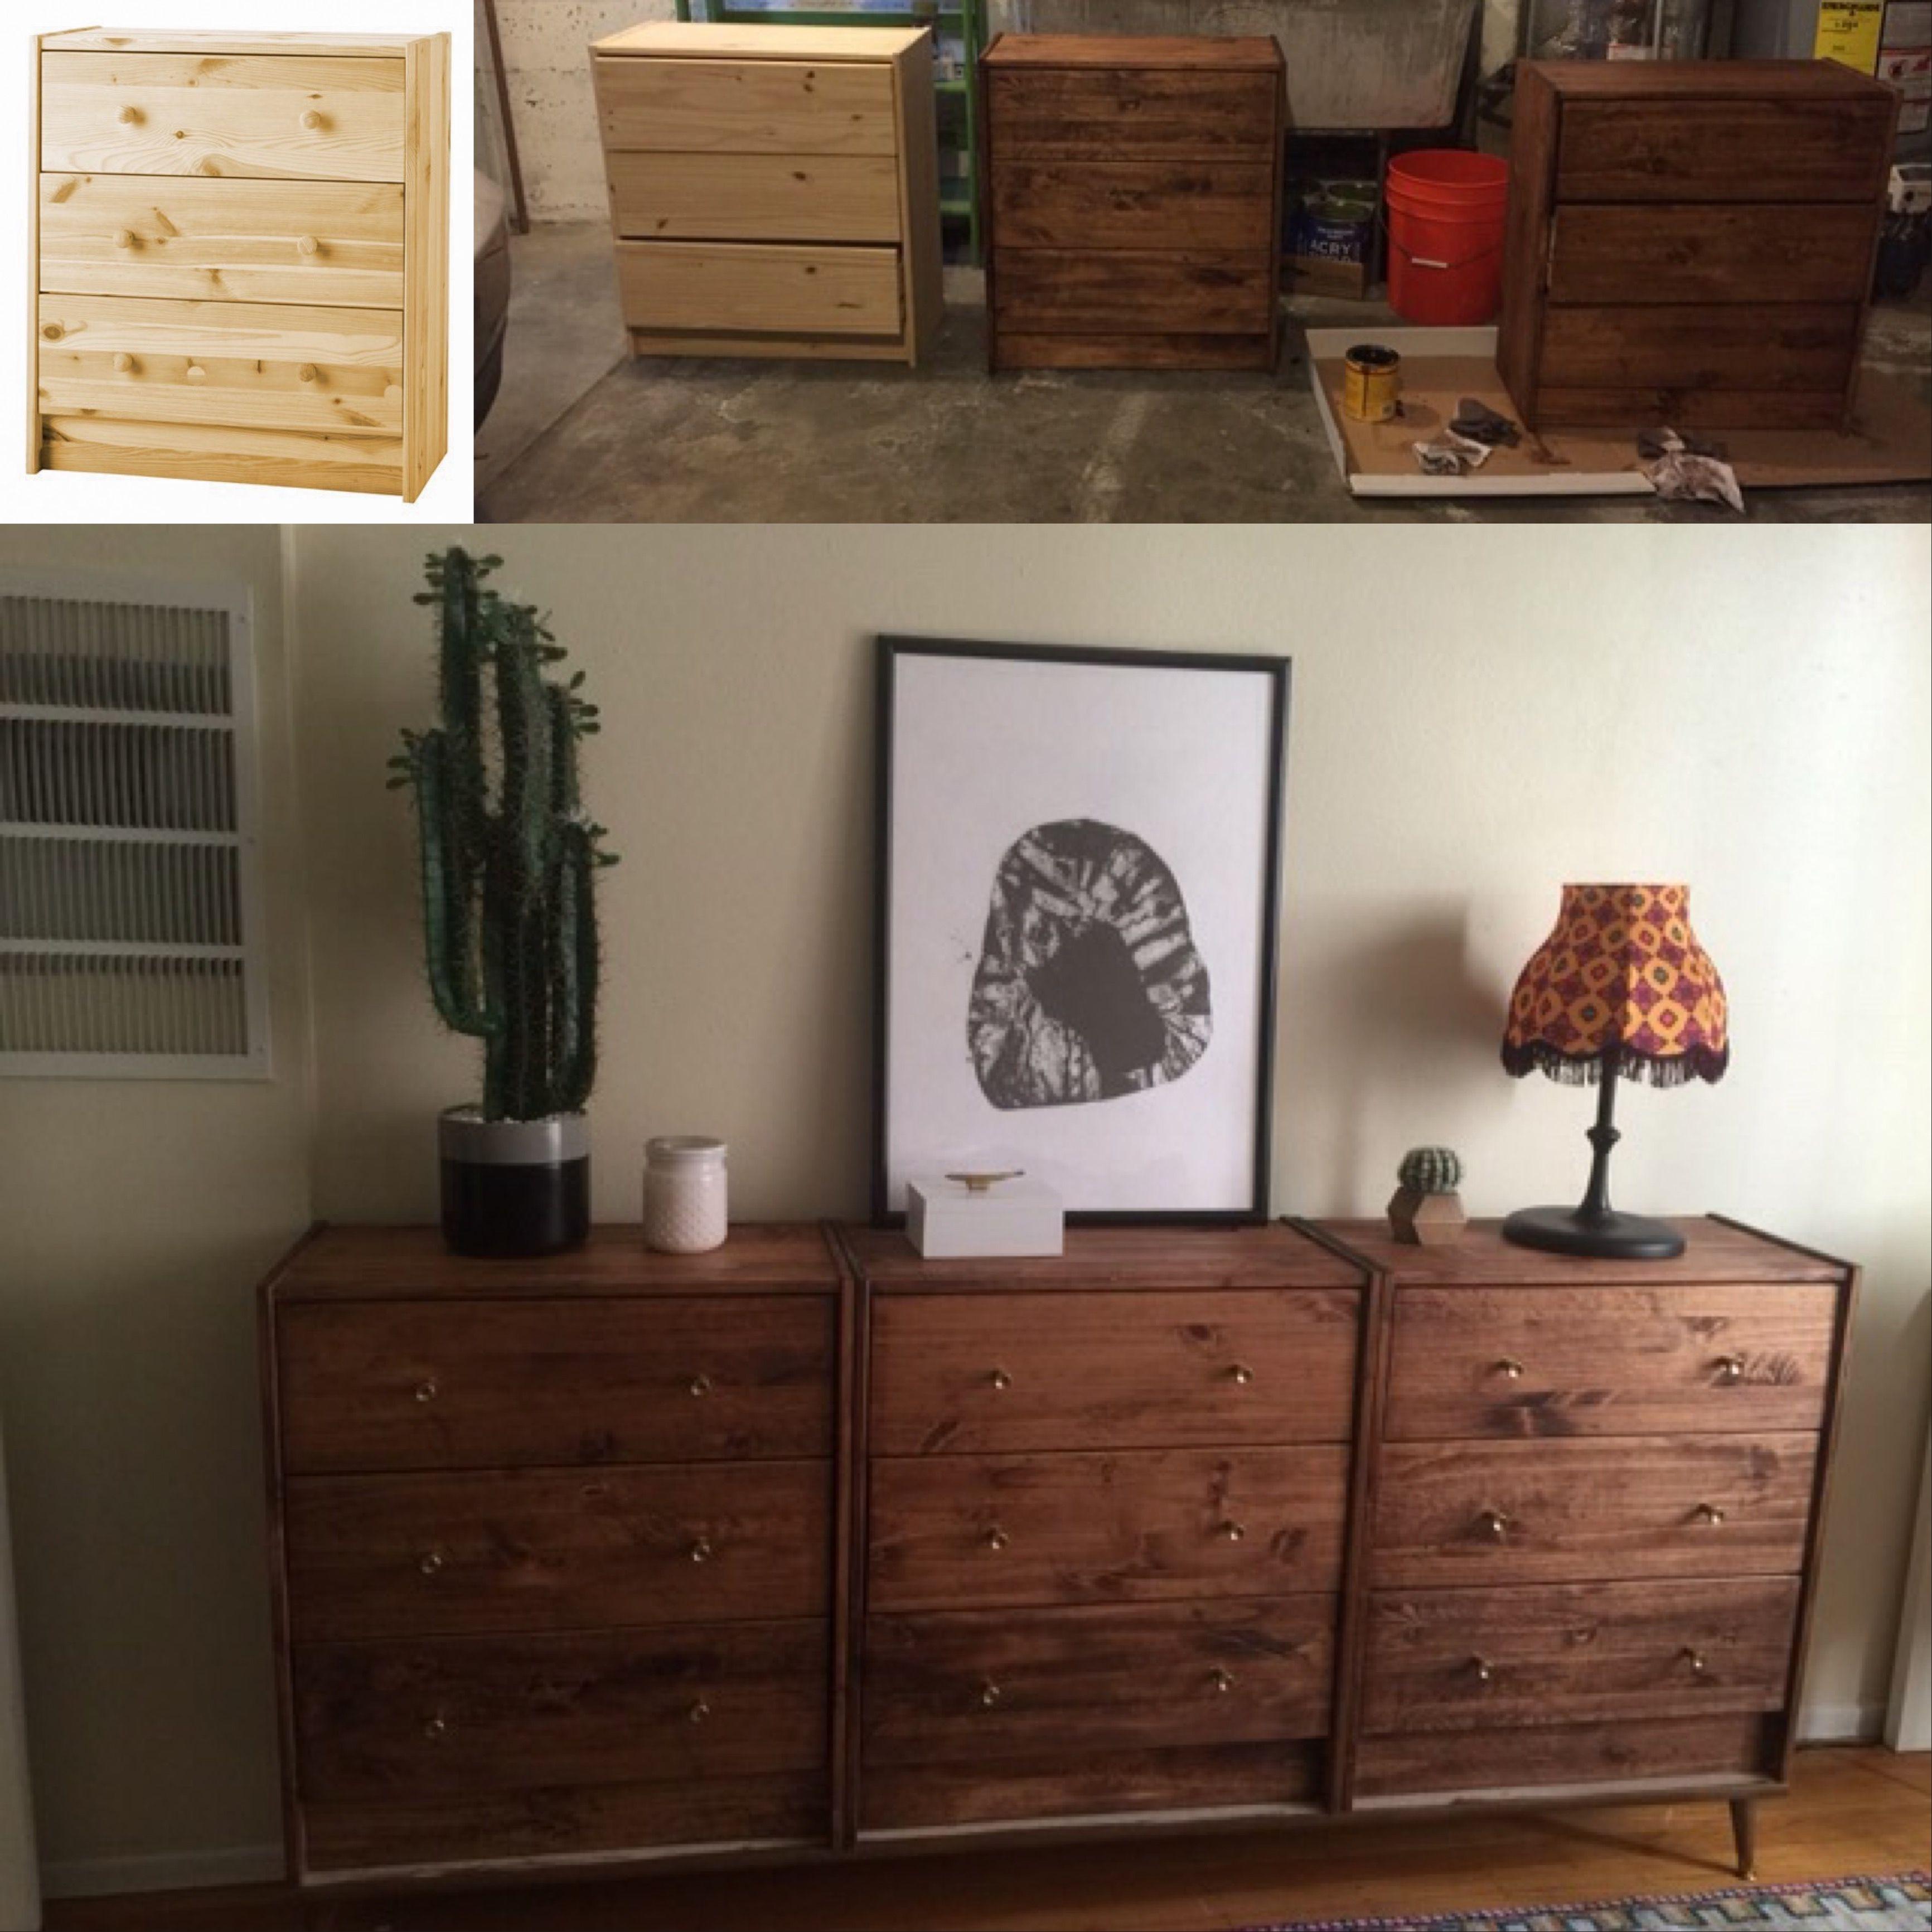 My Diy Ikea Rast Dresser Project 3 Ikea Rast Dressers Minwax